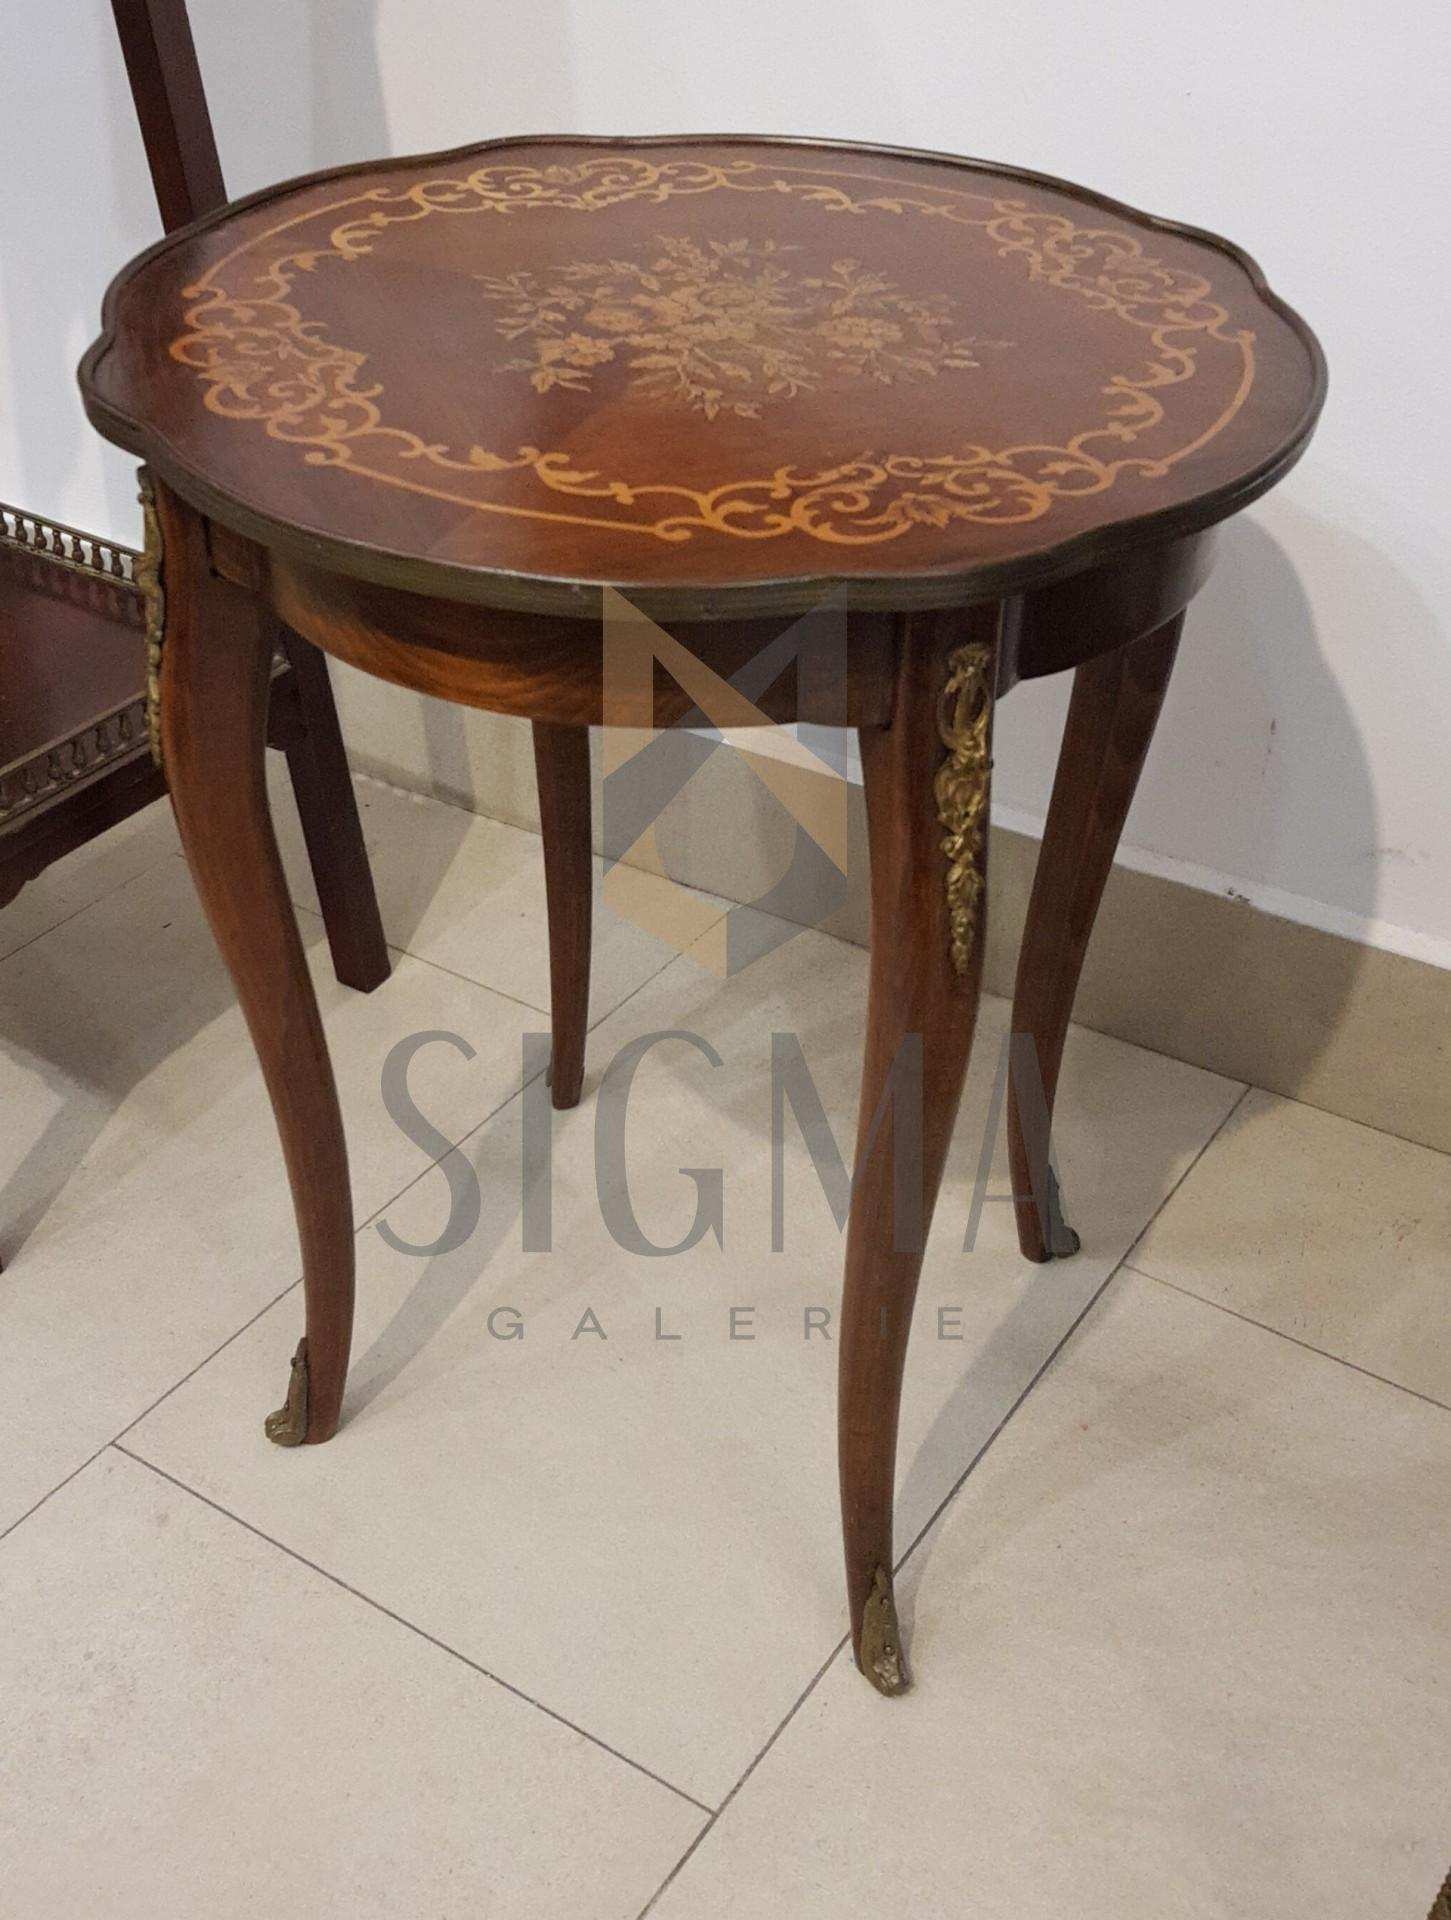 Masuta  cu 4 picioare, bogat decorata, cu intarsii - motive vegetale - si bronz.